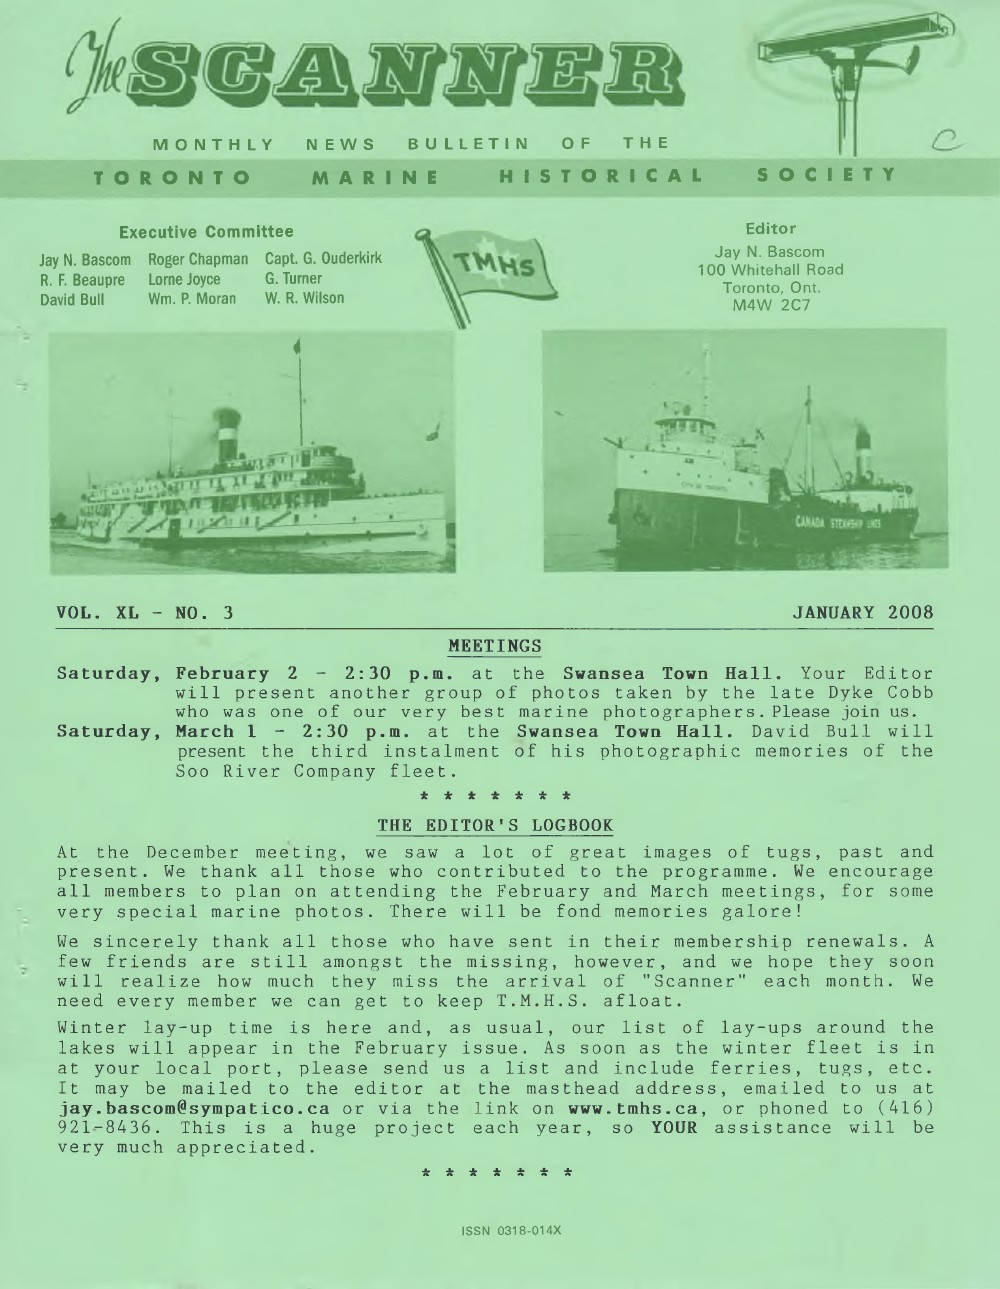 Scanner, v. 40, no. 3 (January 2008)